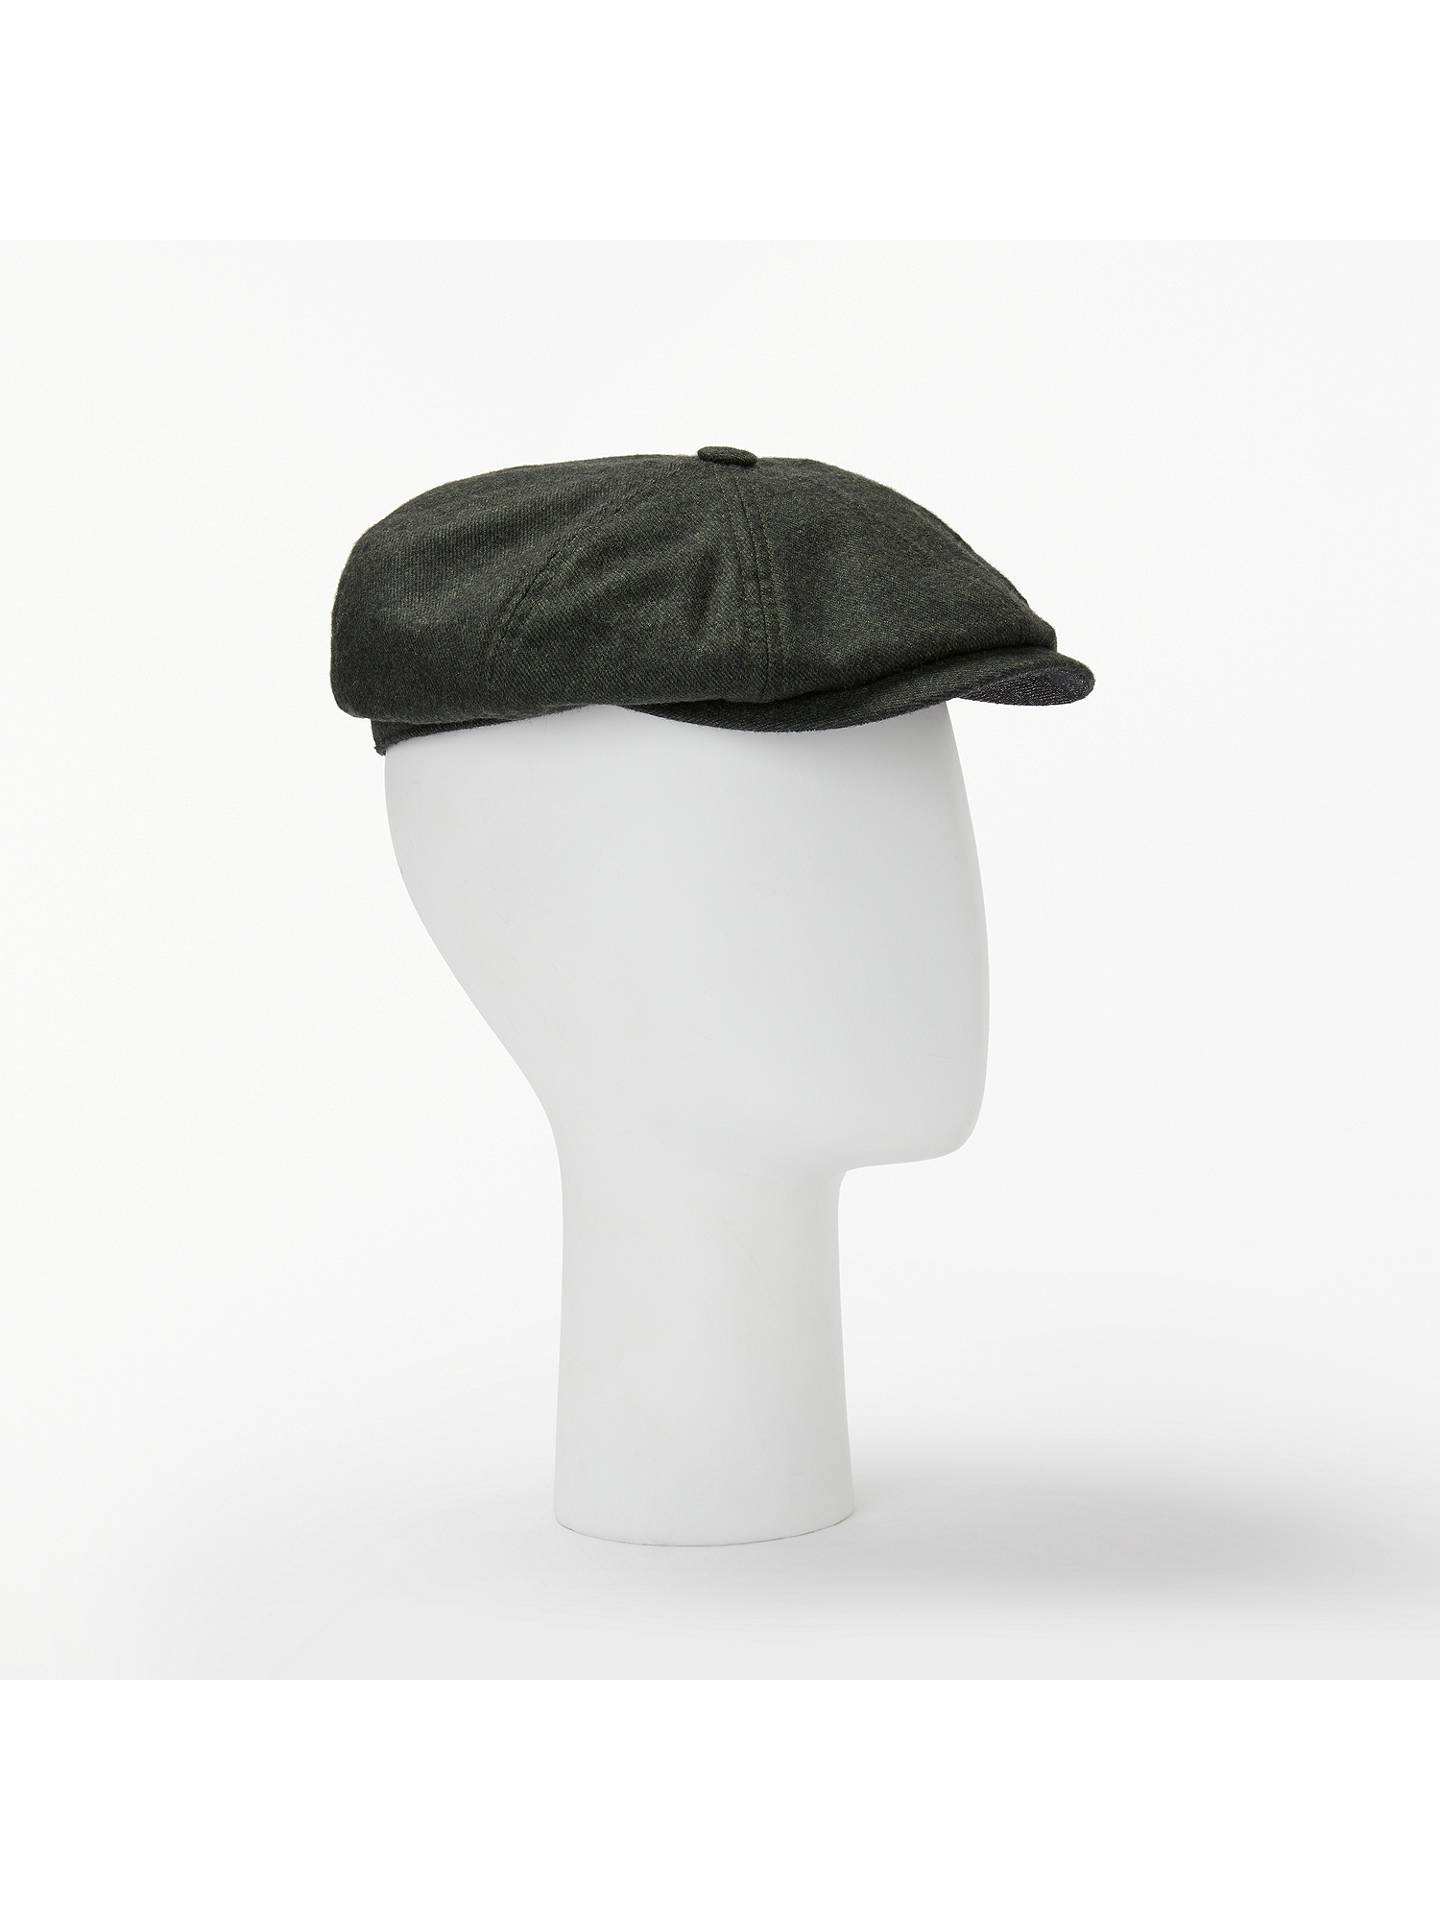 BuyTed Baker Baker Boy Hat f29ccd00a03